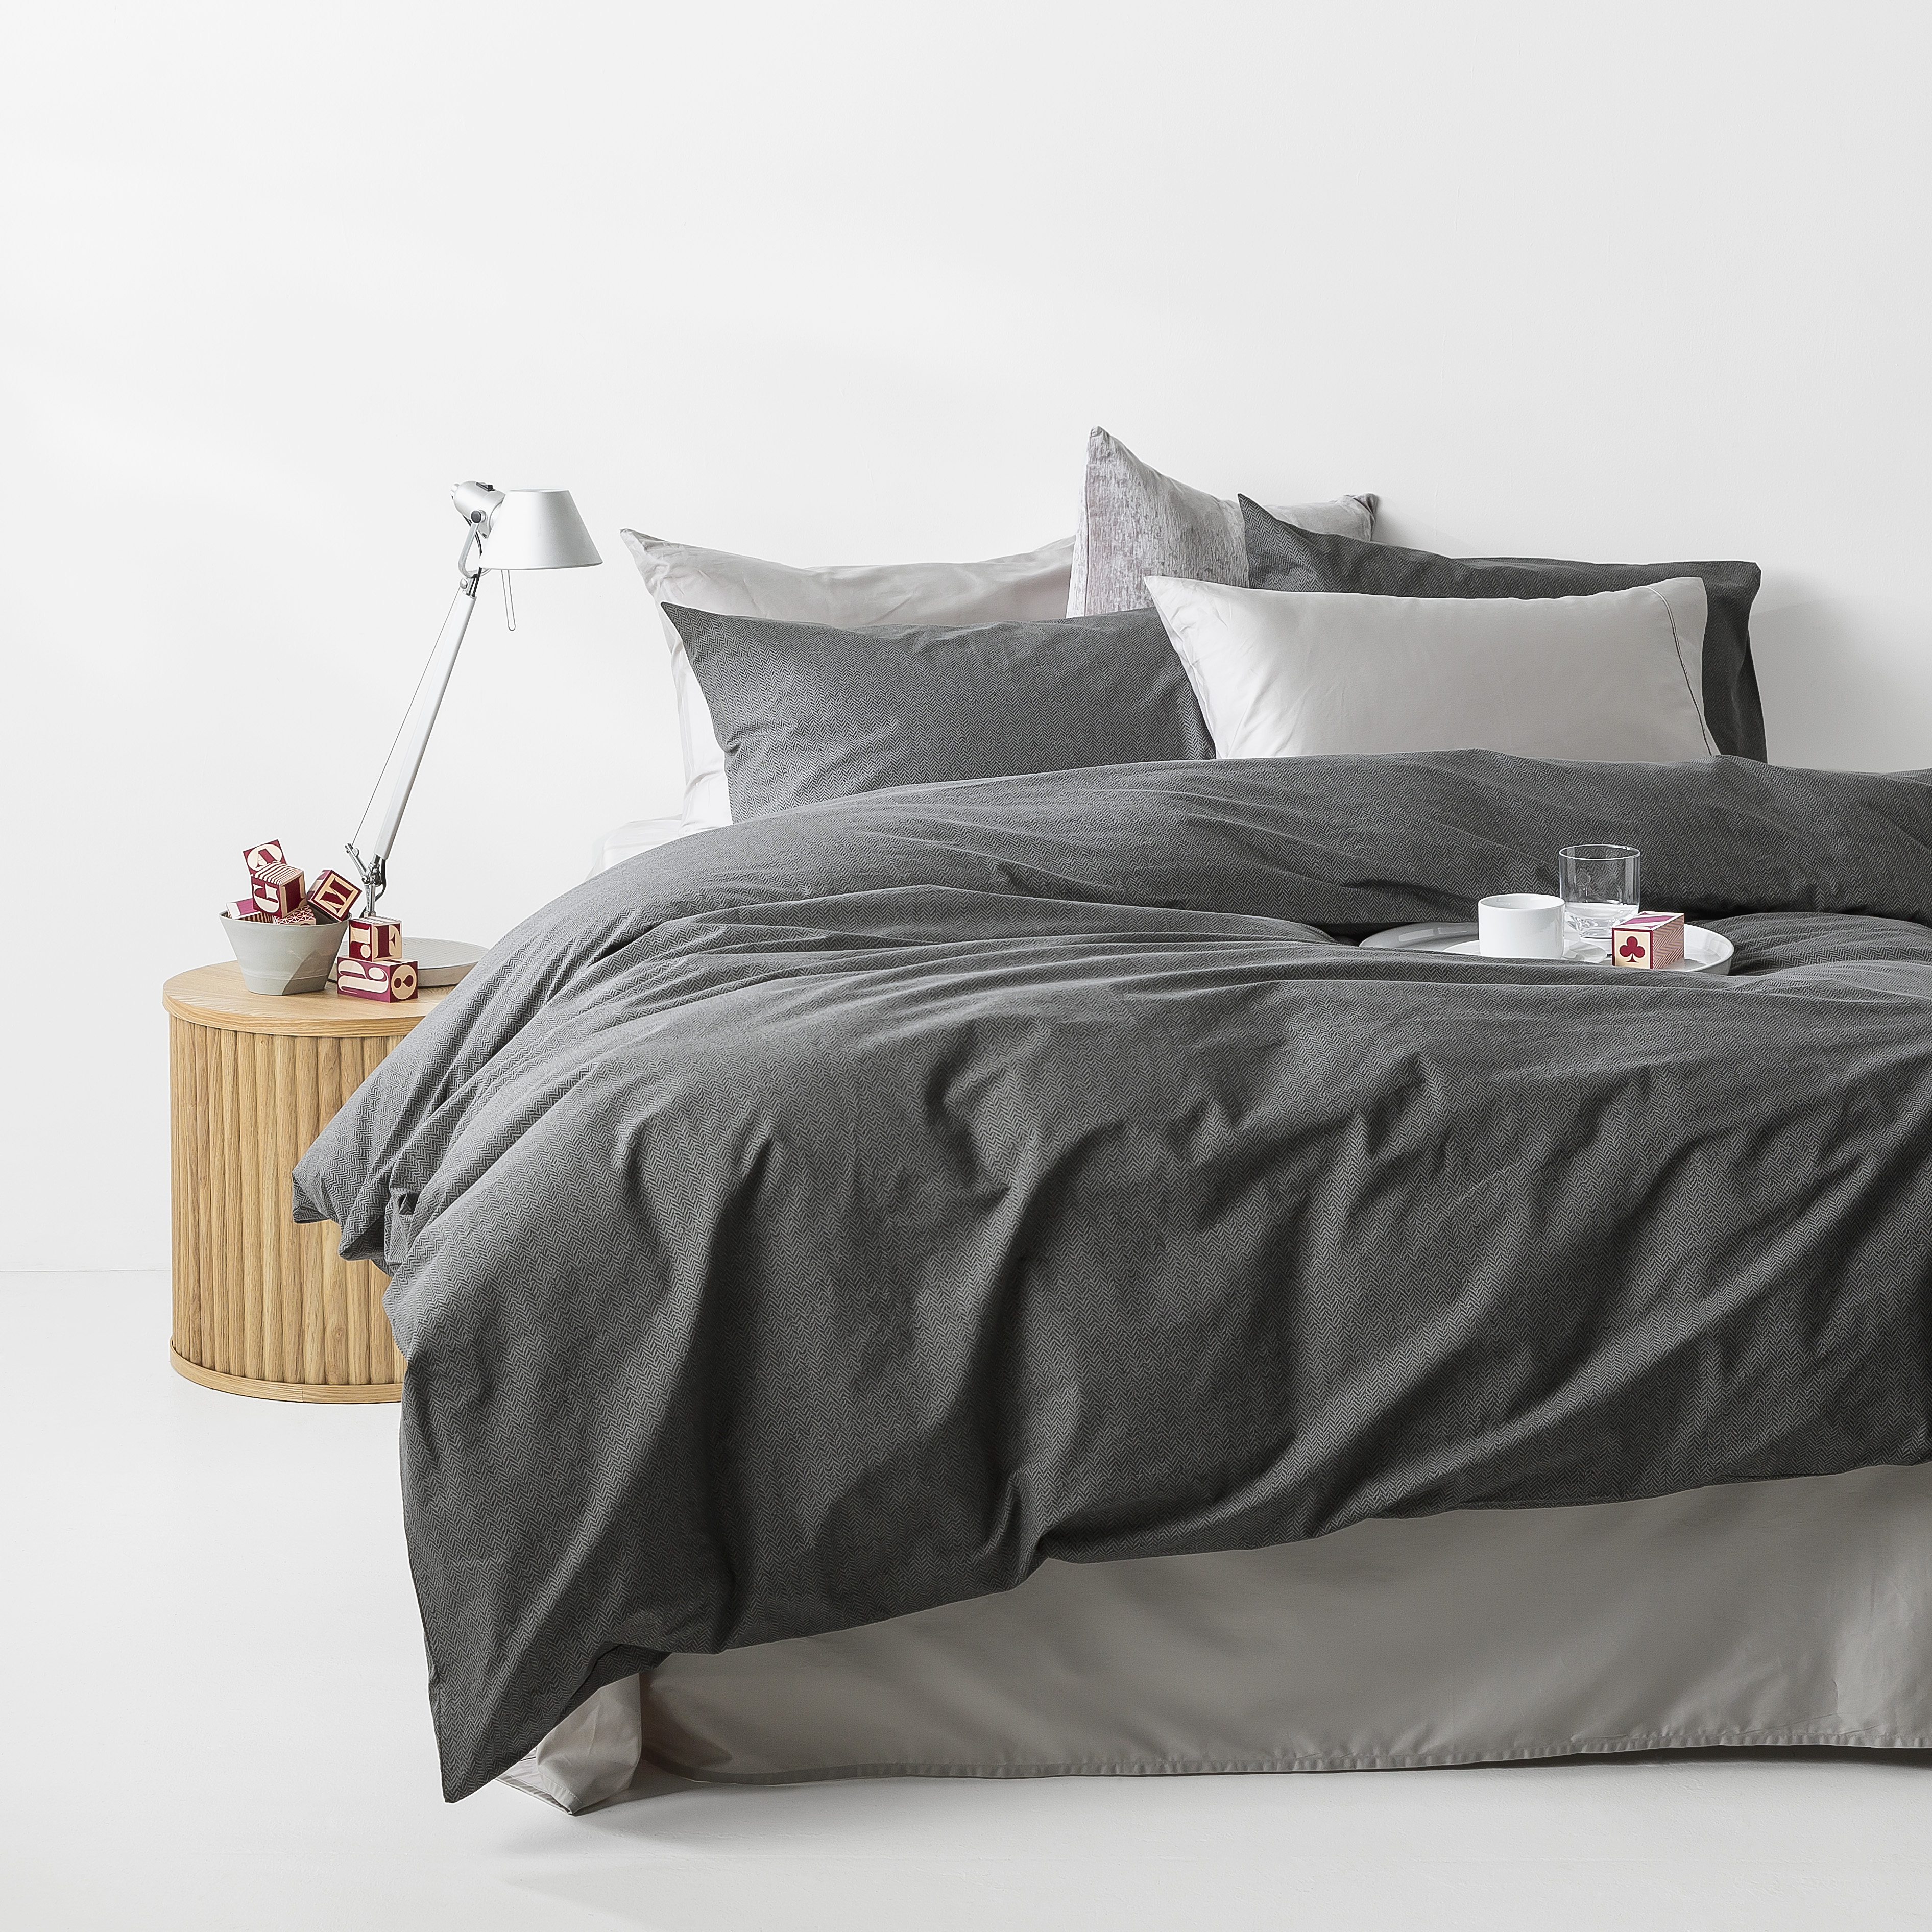 In2linen Herringbone print 100% Organic Cotton  Quilt Cover Set | Charcoal